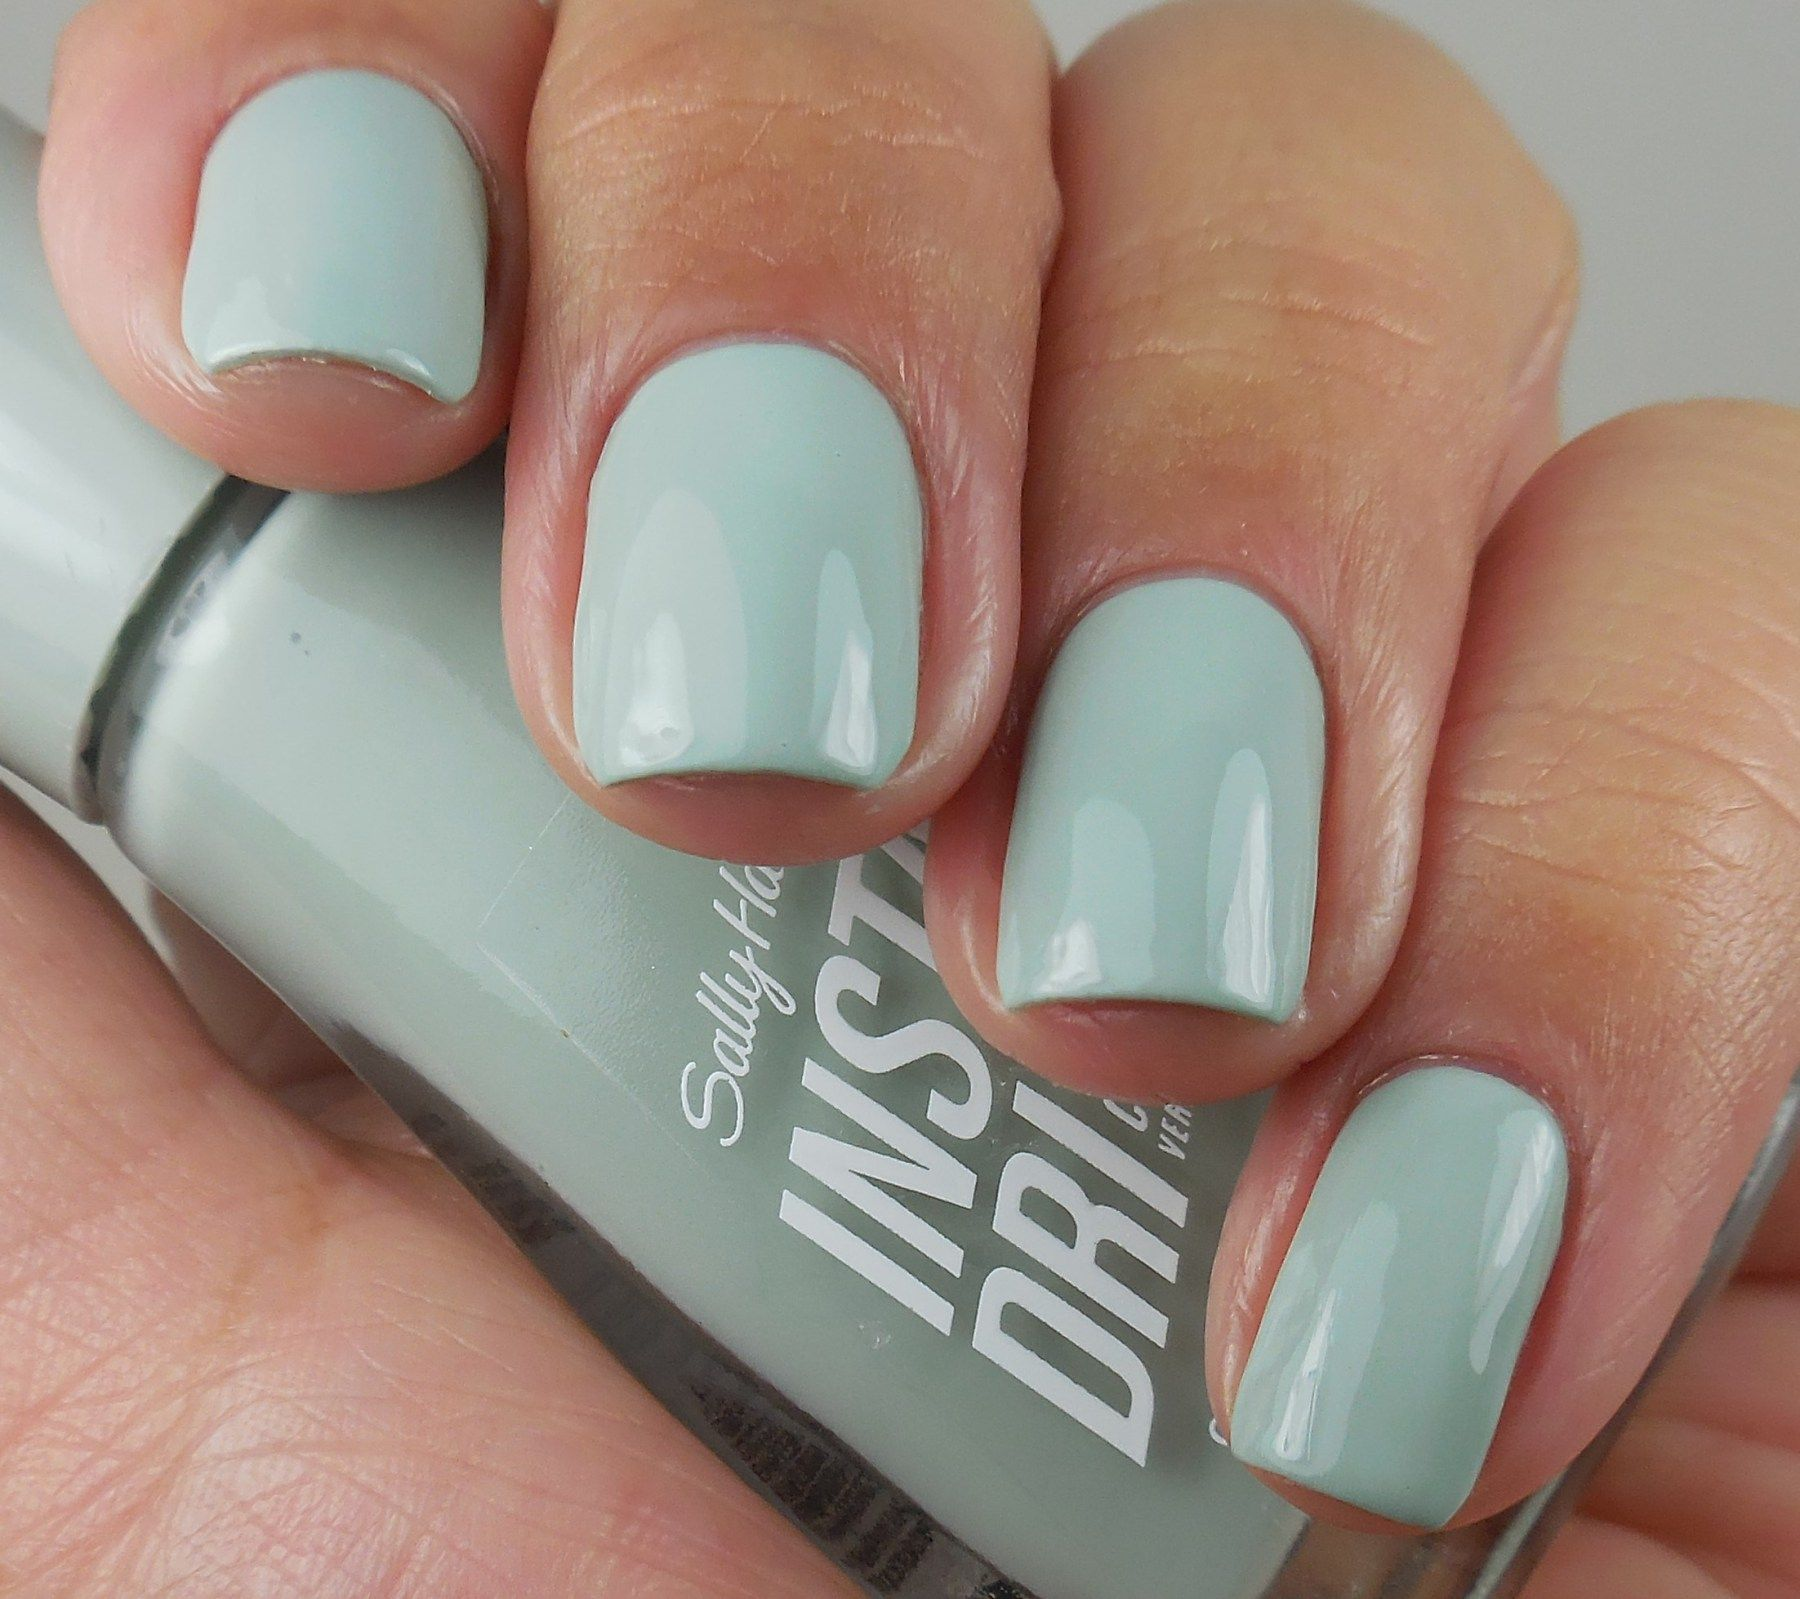 Sally Hansen Insta-Dri Reformulated – Swatches & Review | nails ...